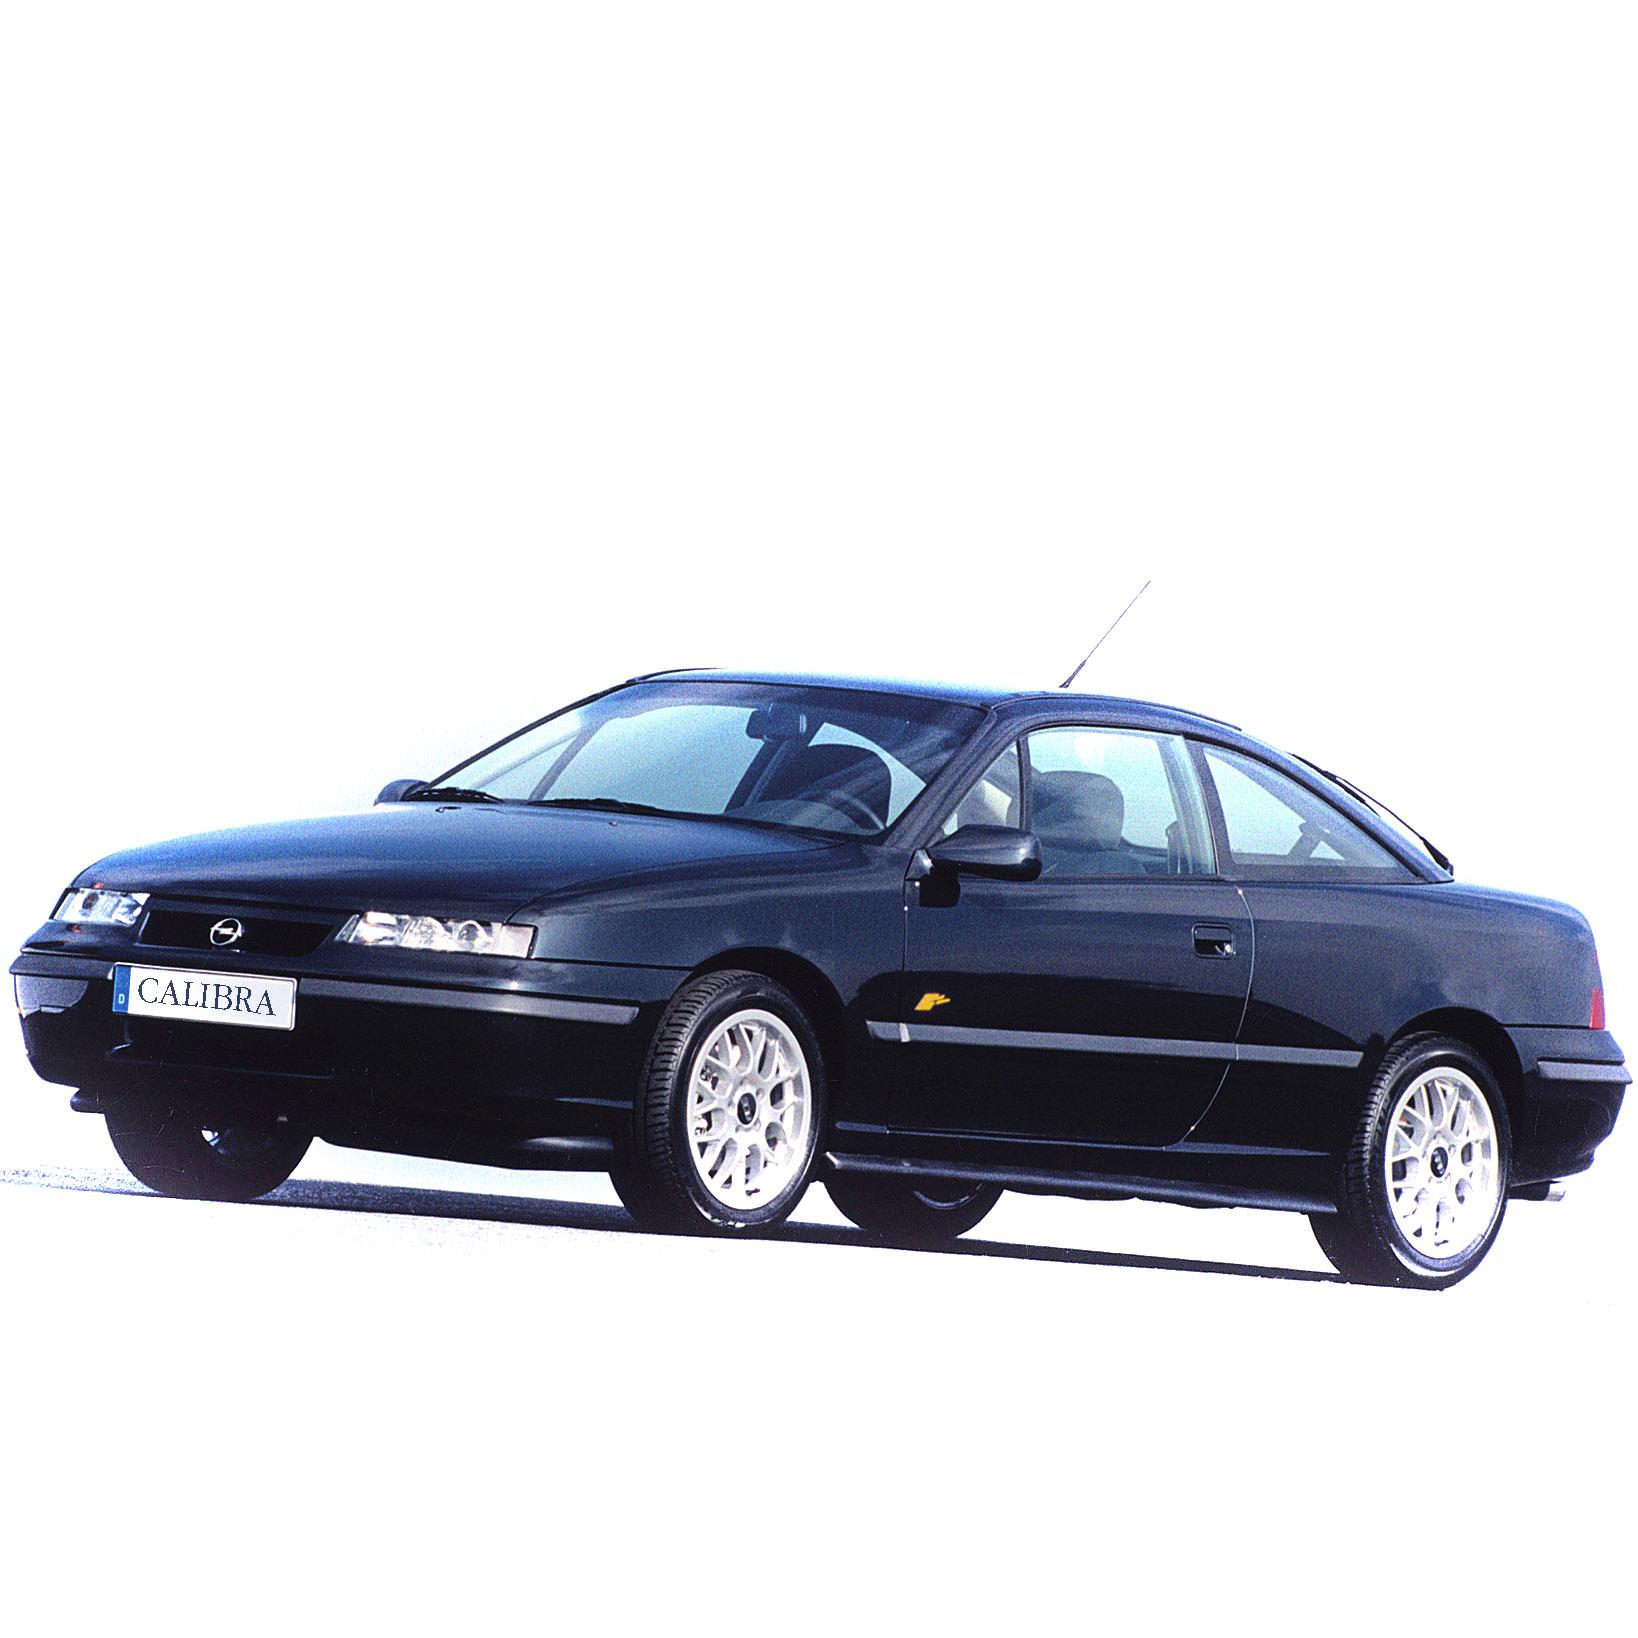 Vauxhall Calibra & Cavalier Mk3 1985-1995